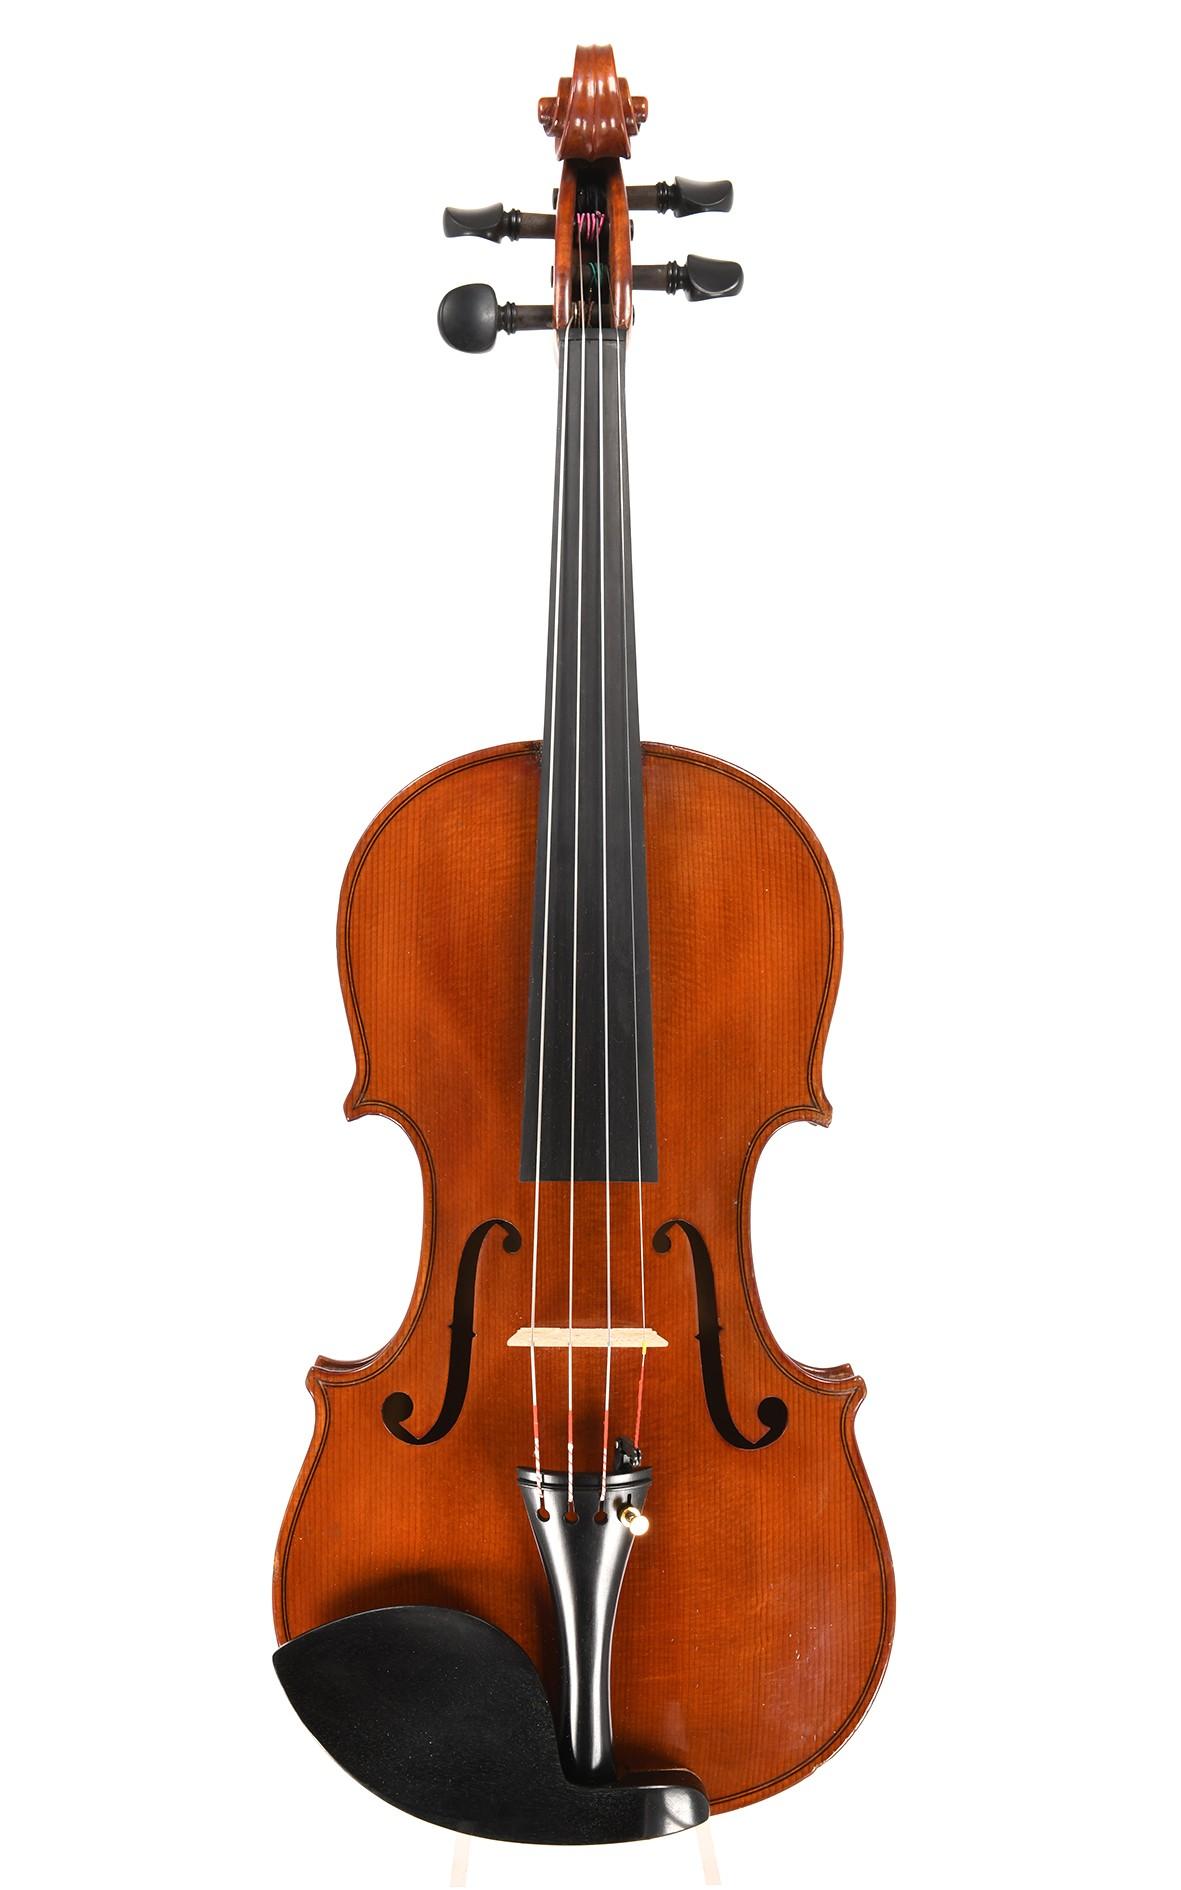 Italienische 7/8 Geige von Carlo Melloni, Zertifikat Eric Blot